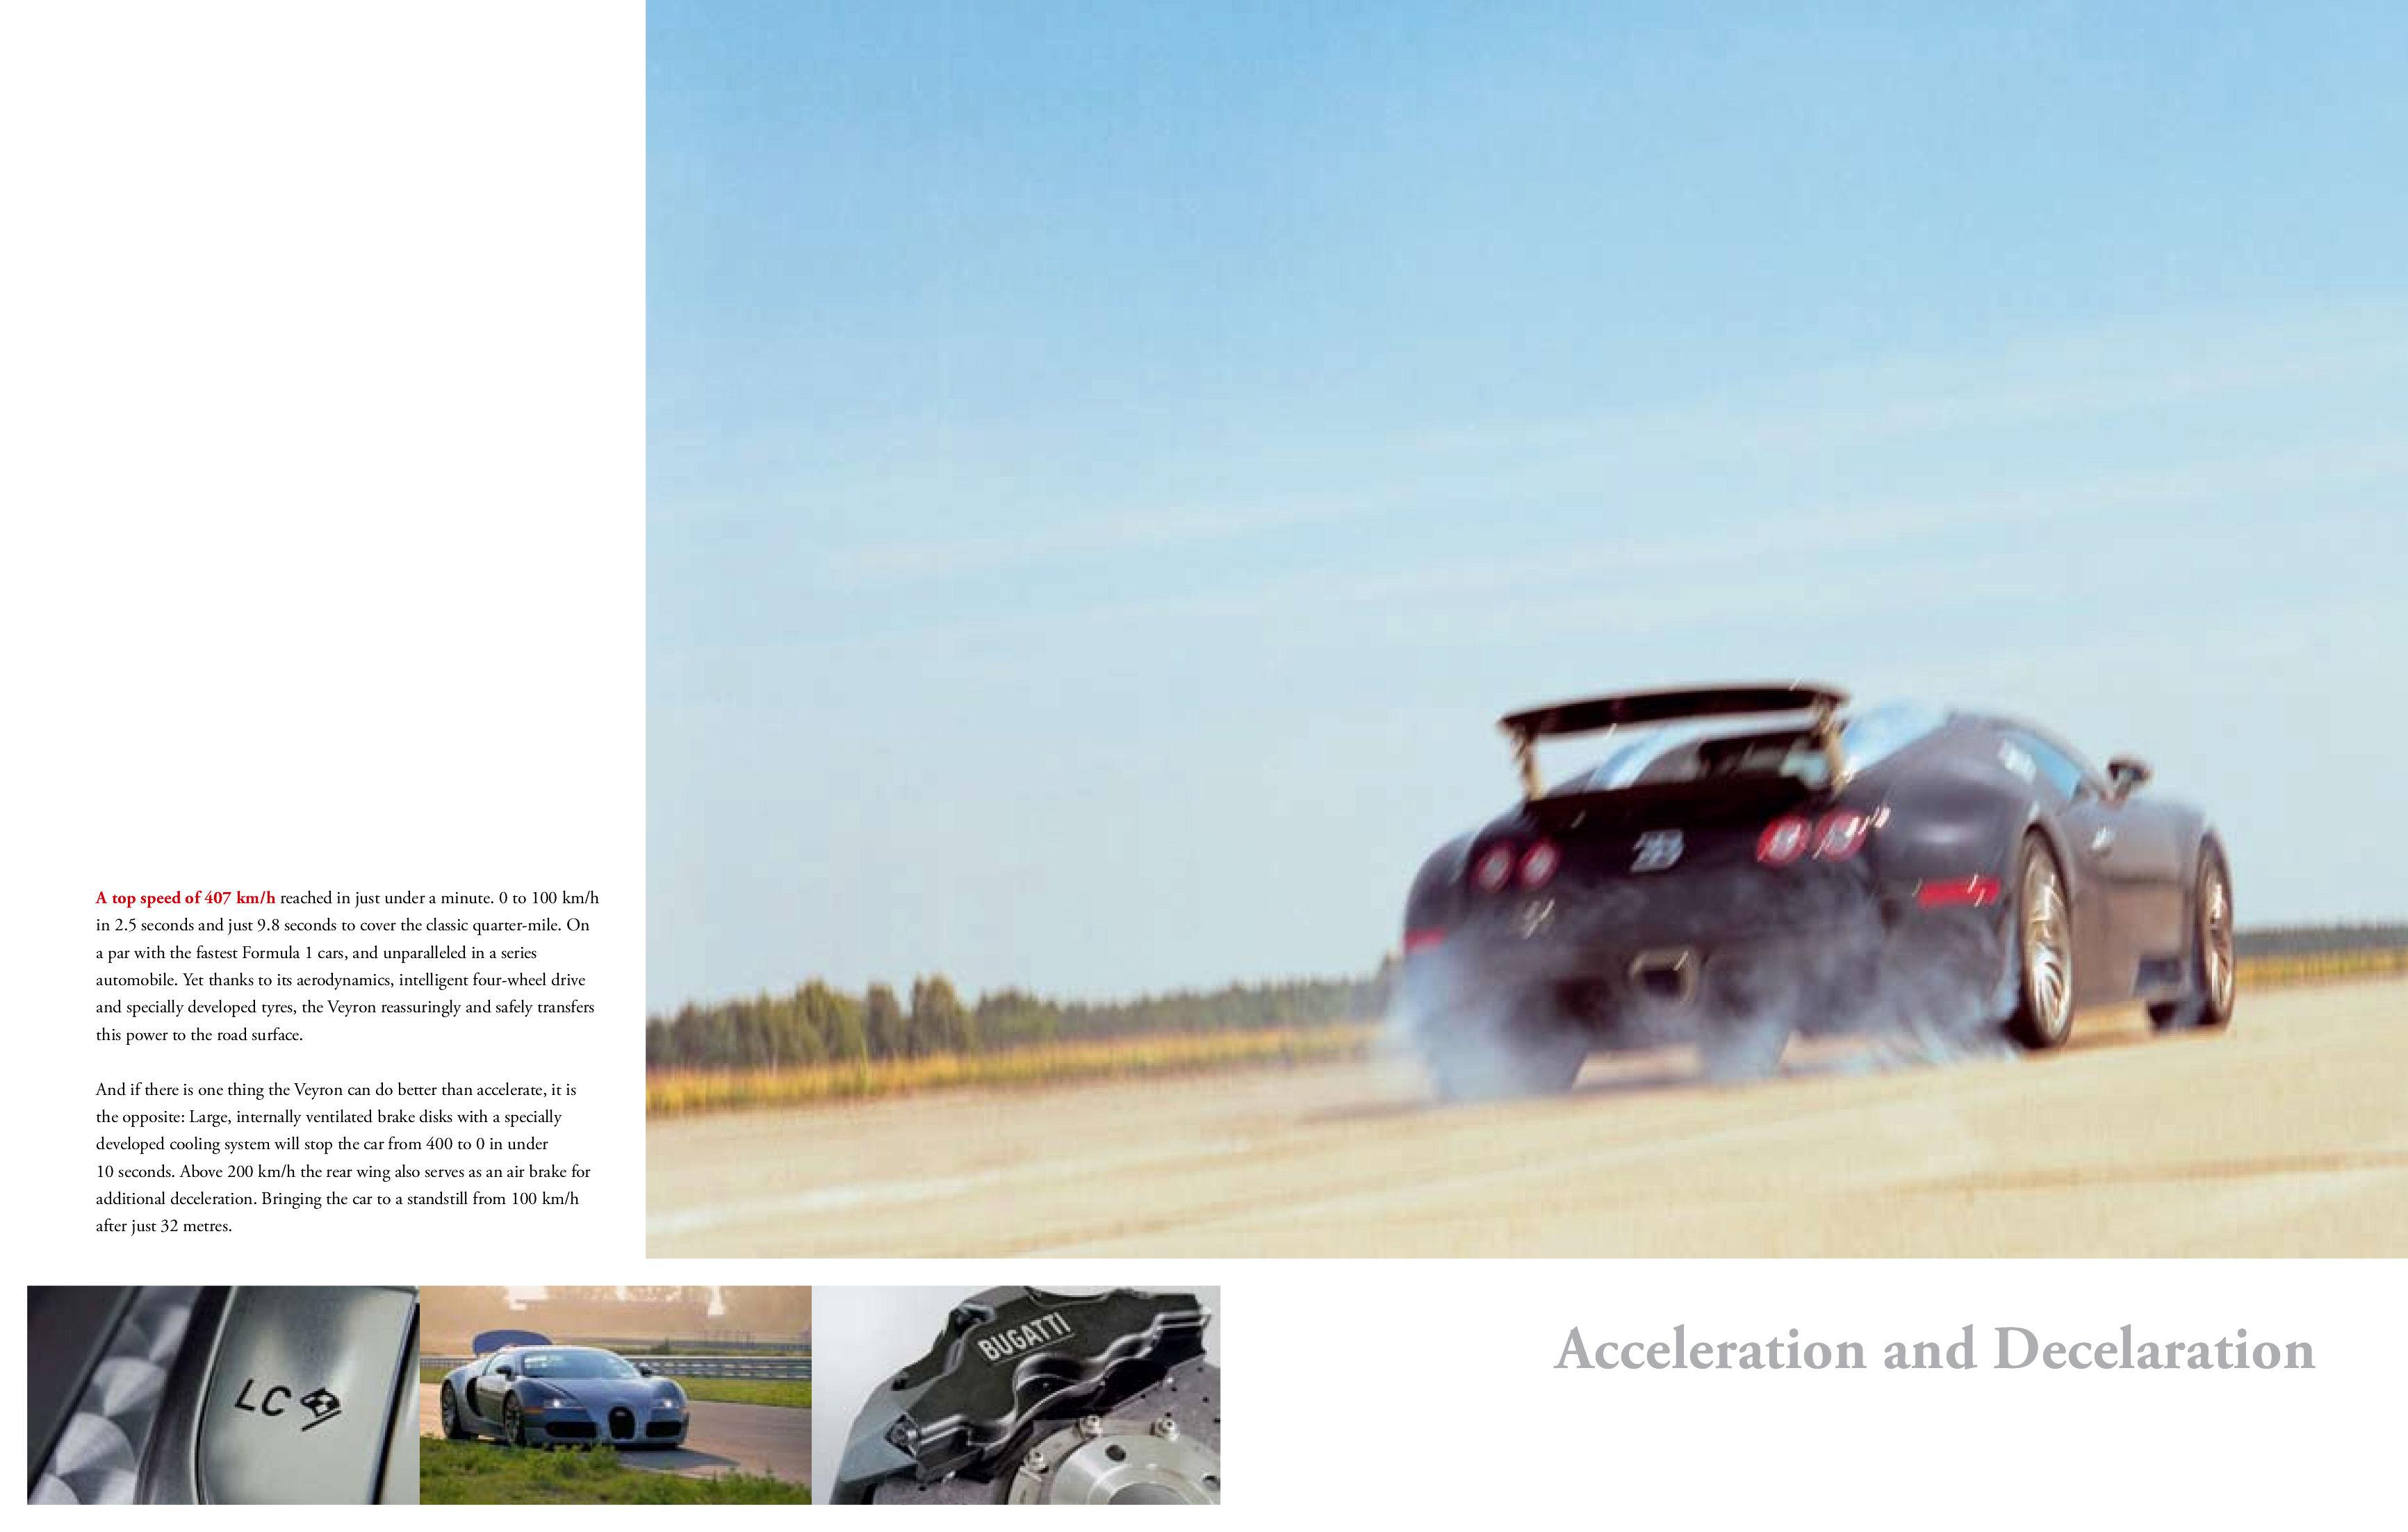 Bugatti%202007%20Veyron%206 Inspiring Bugatti Veyron Quarter Mile Speed Cars Trend